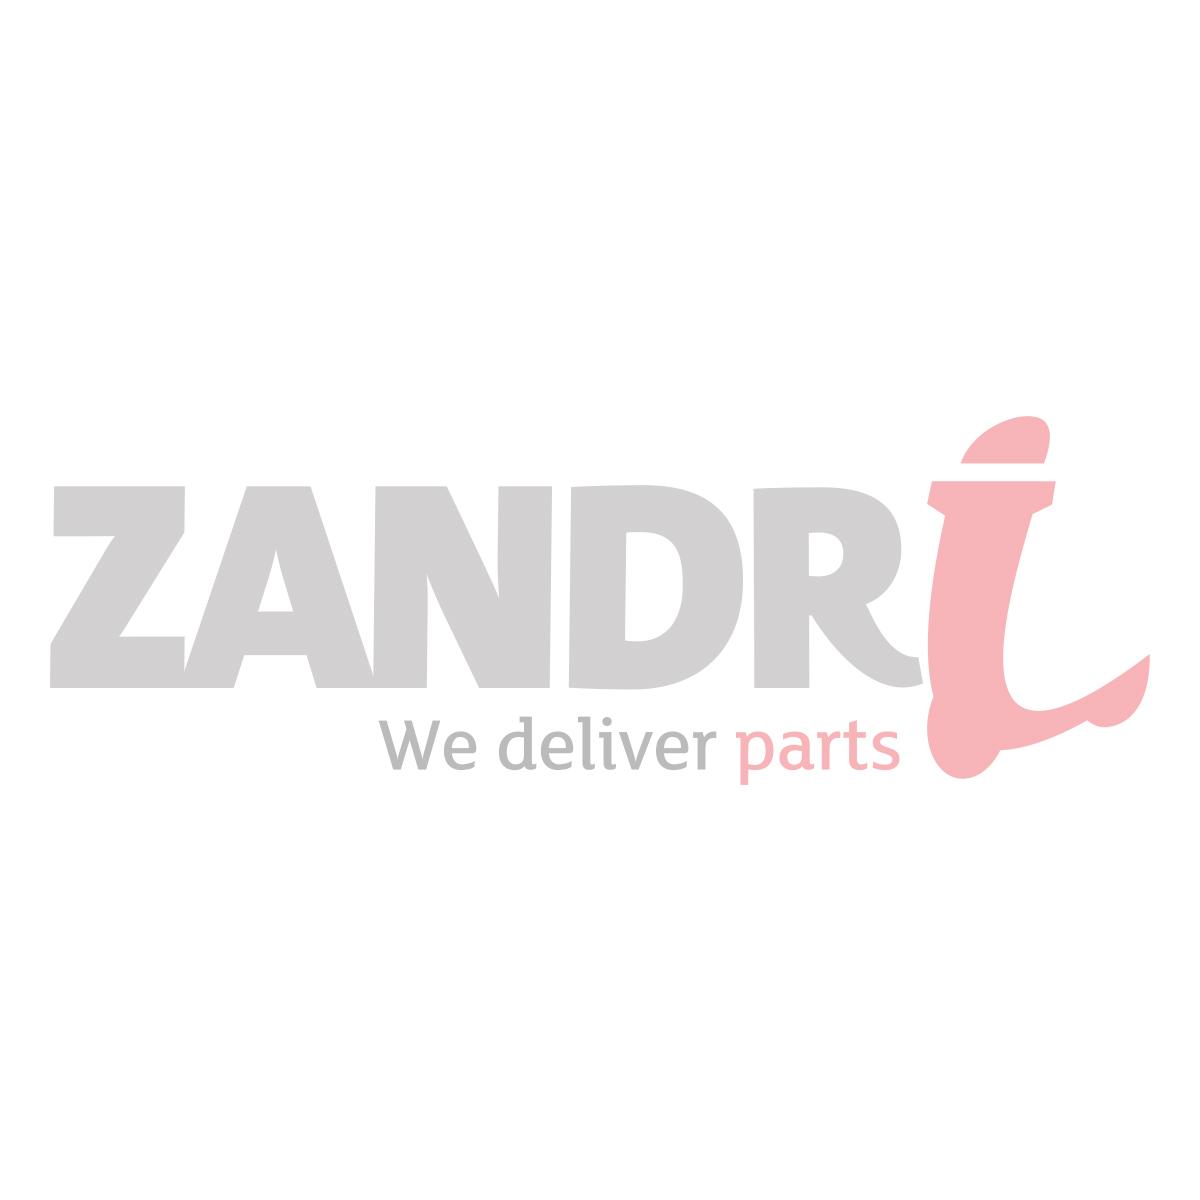 Buddy / Zadelslot Piaggio Lx / Vespa (kabel)